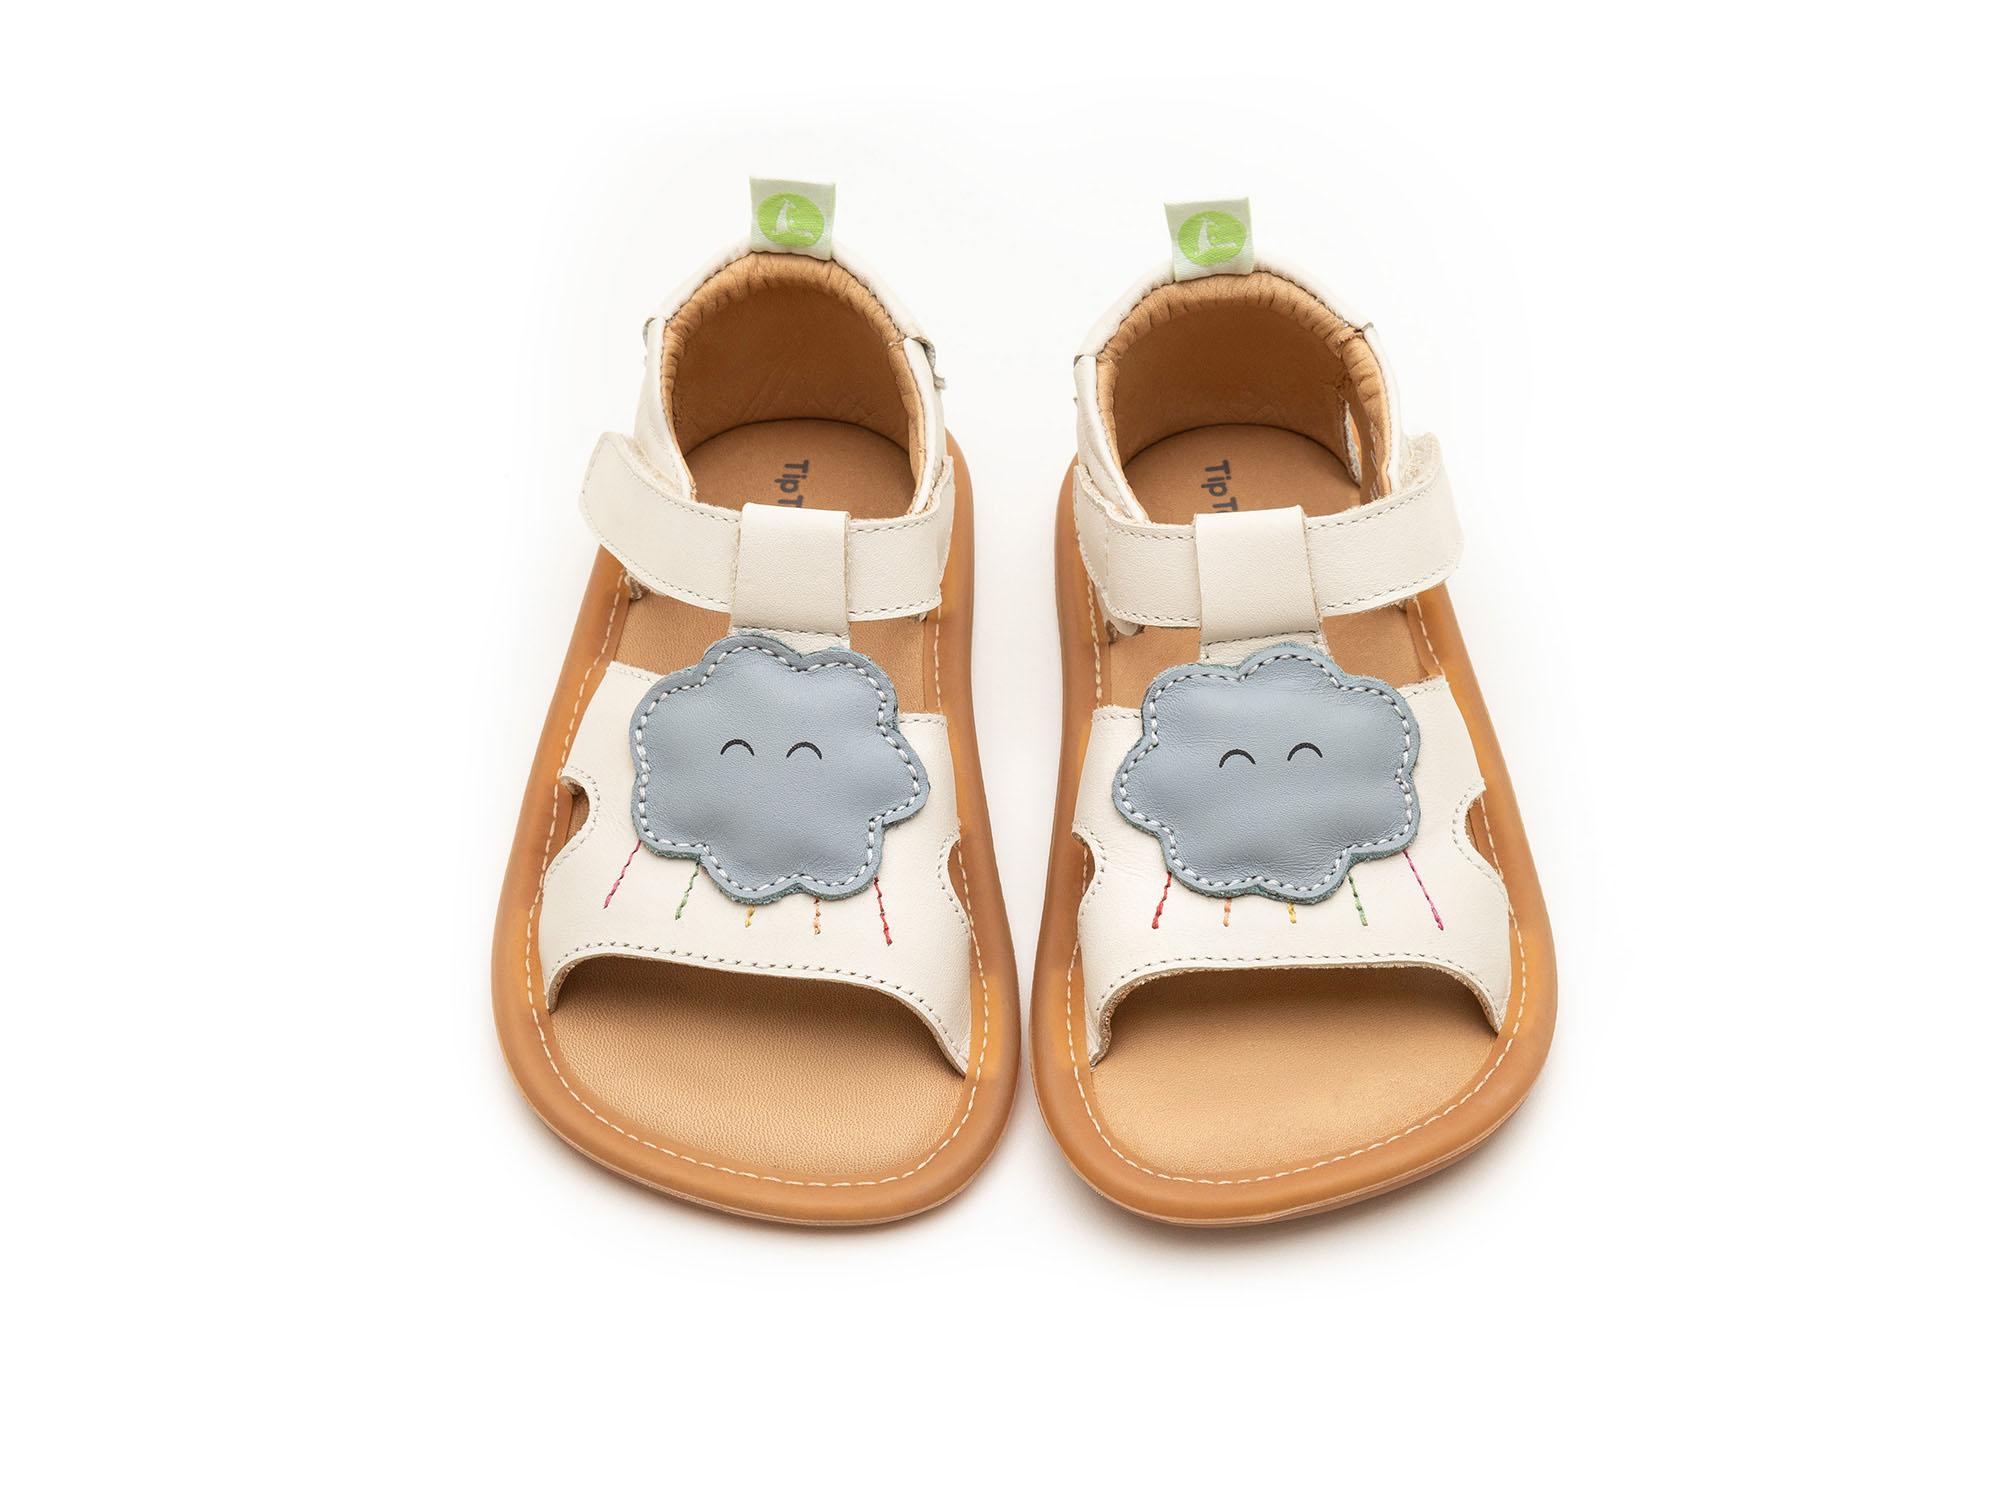 sandalia Bebê unisex1 rainy